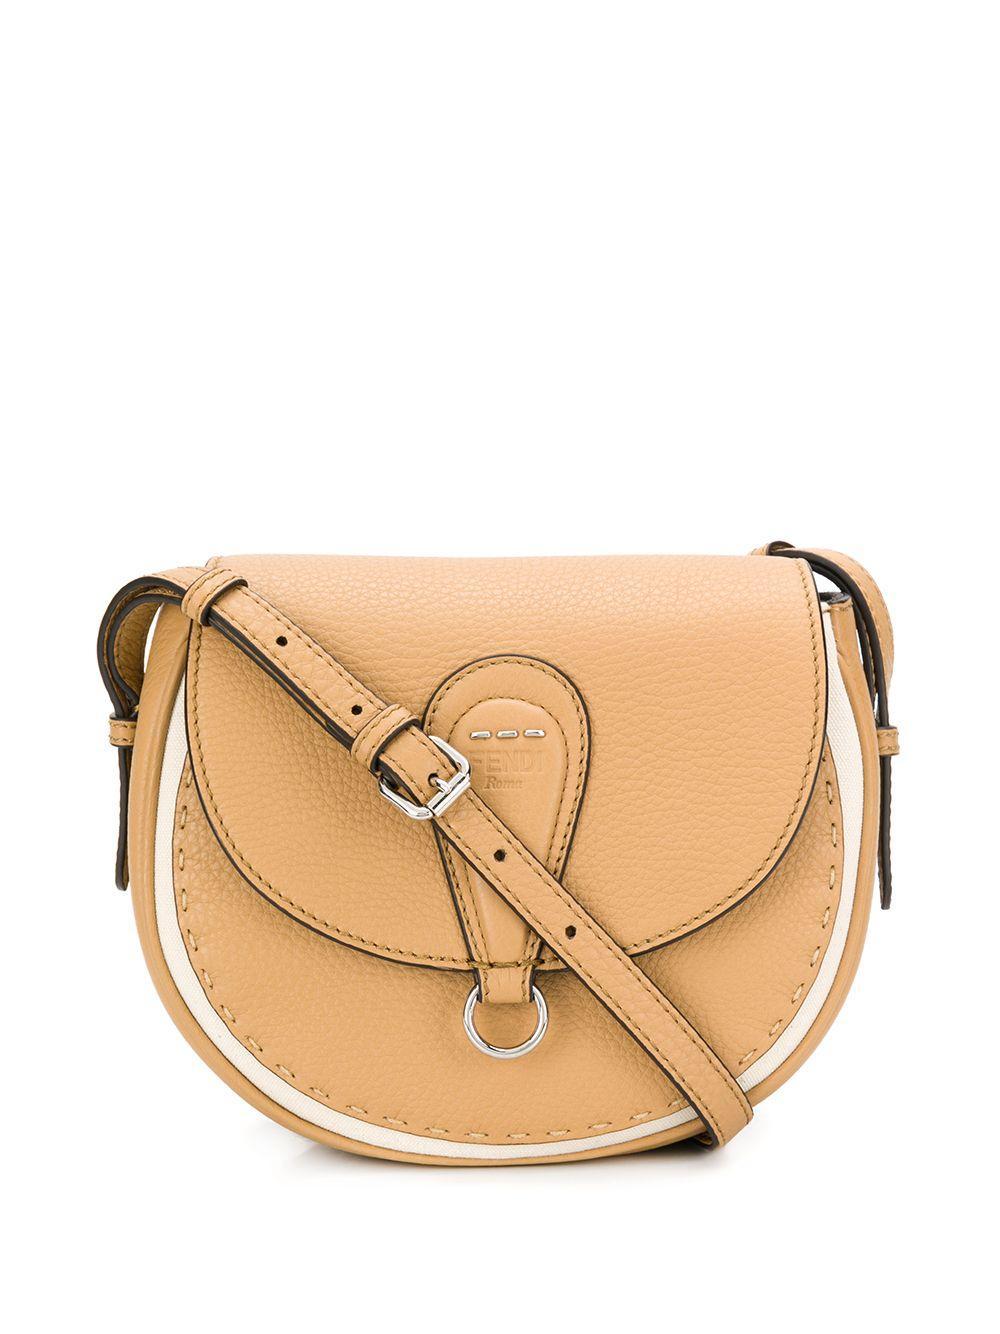 8aec8fb39f Lyst - Fendi Selleria Leather Shoulder Bag in Natural